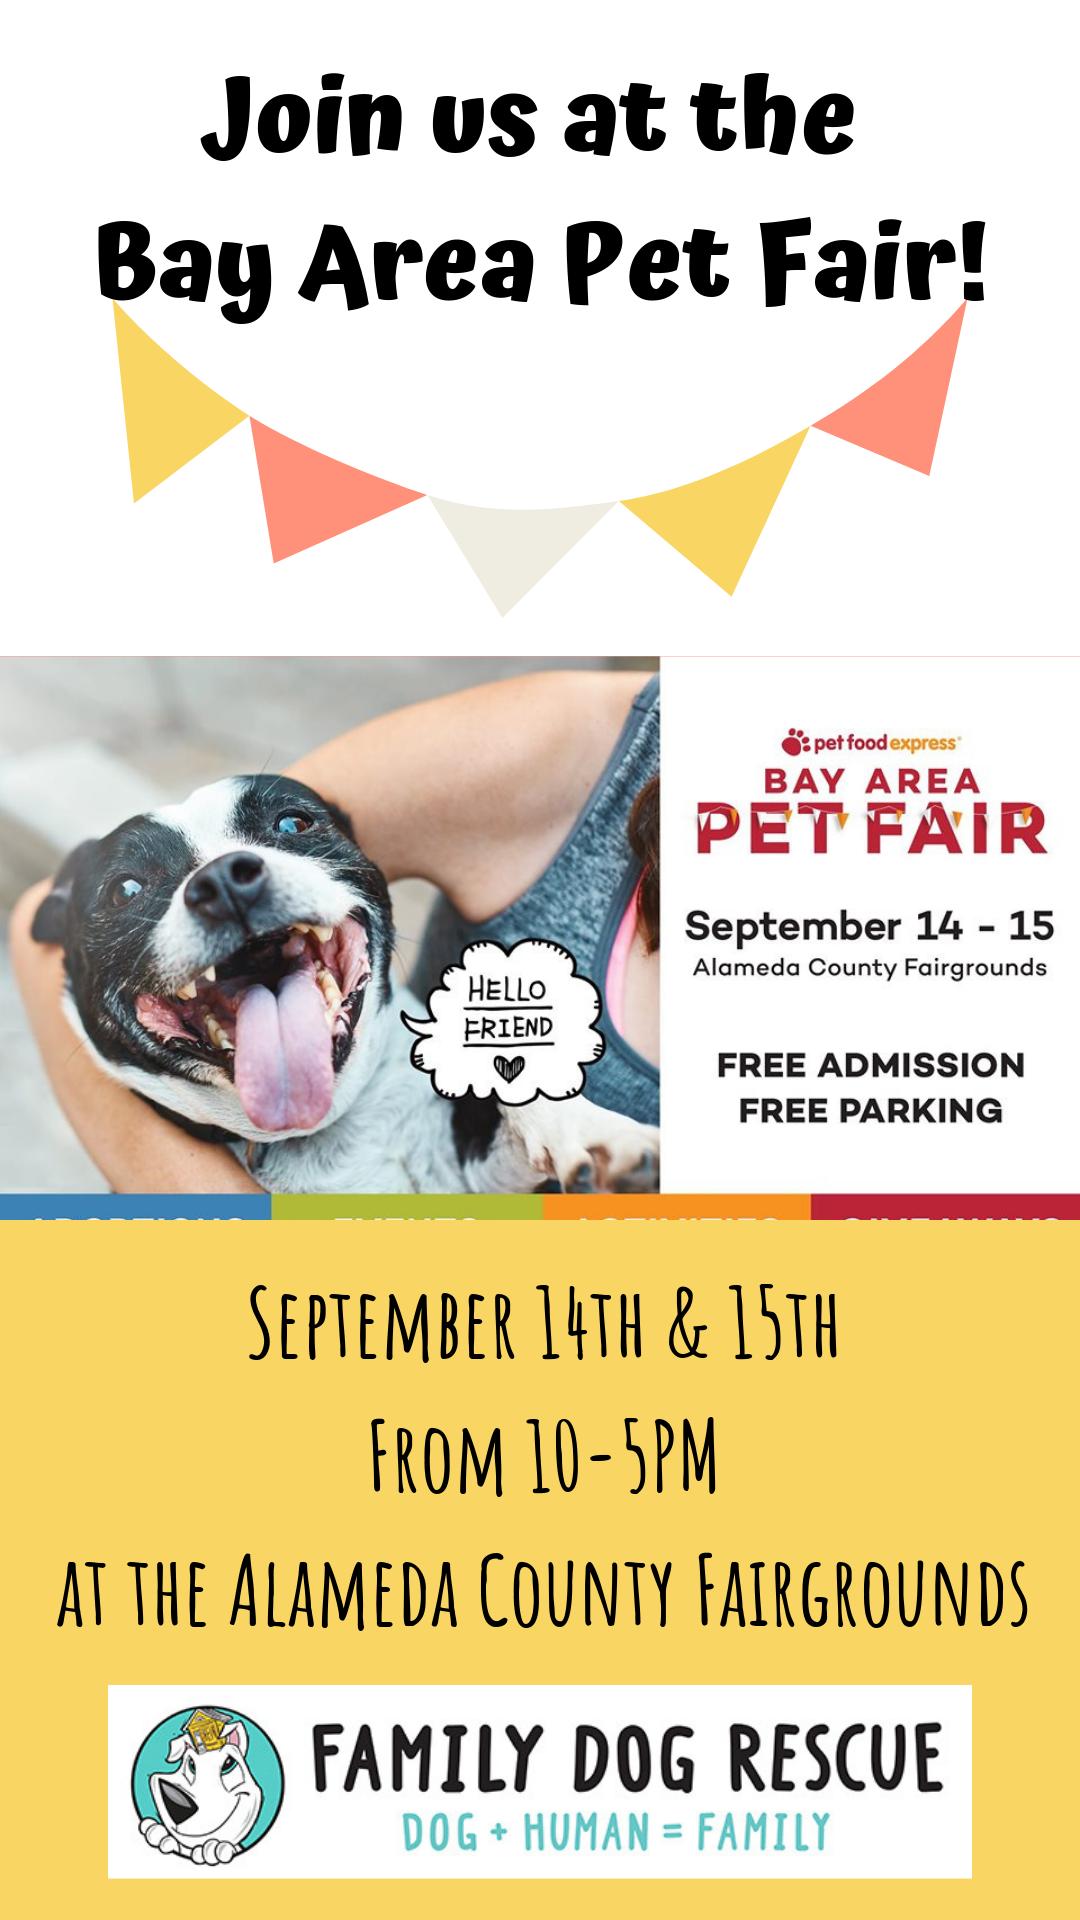 Bay Area Pet Fair! @ Alameda County Fairgrounds in Pleasanton